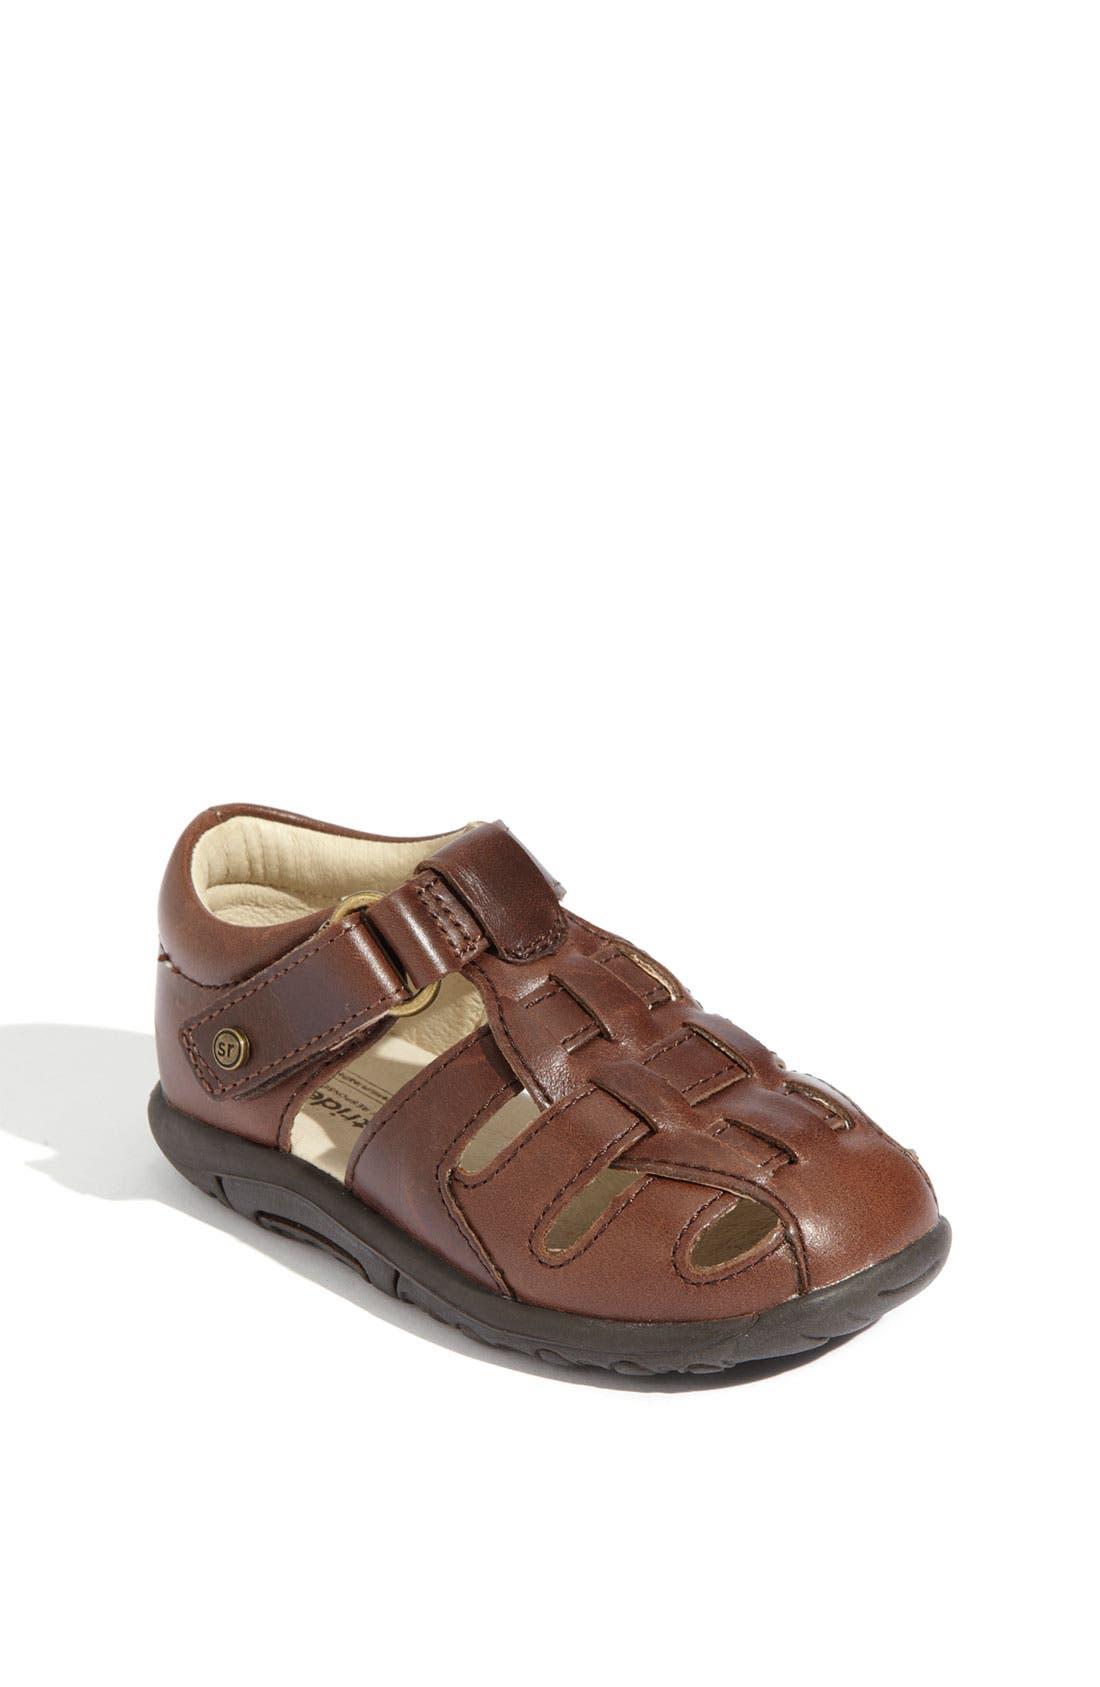 Main Image - Stride Rite 'Harper' Sandal (Baby, Walker & Toddler)